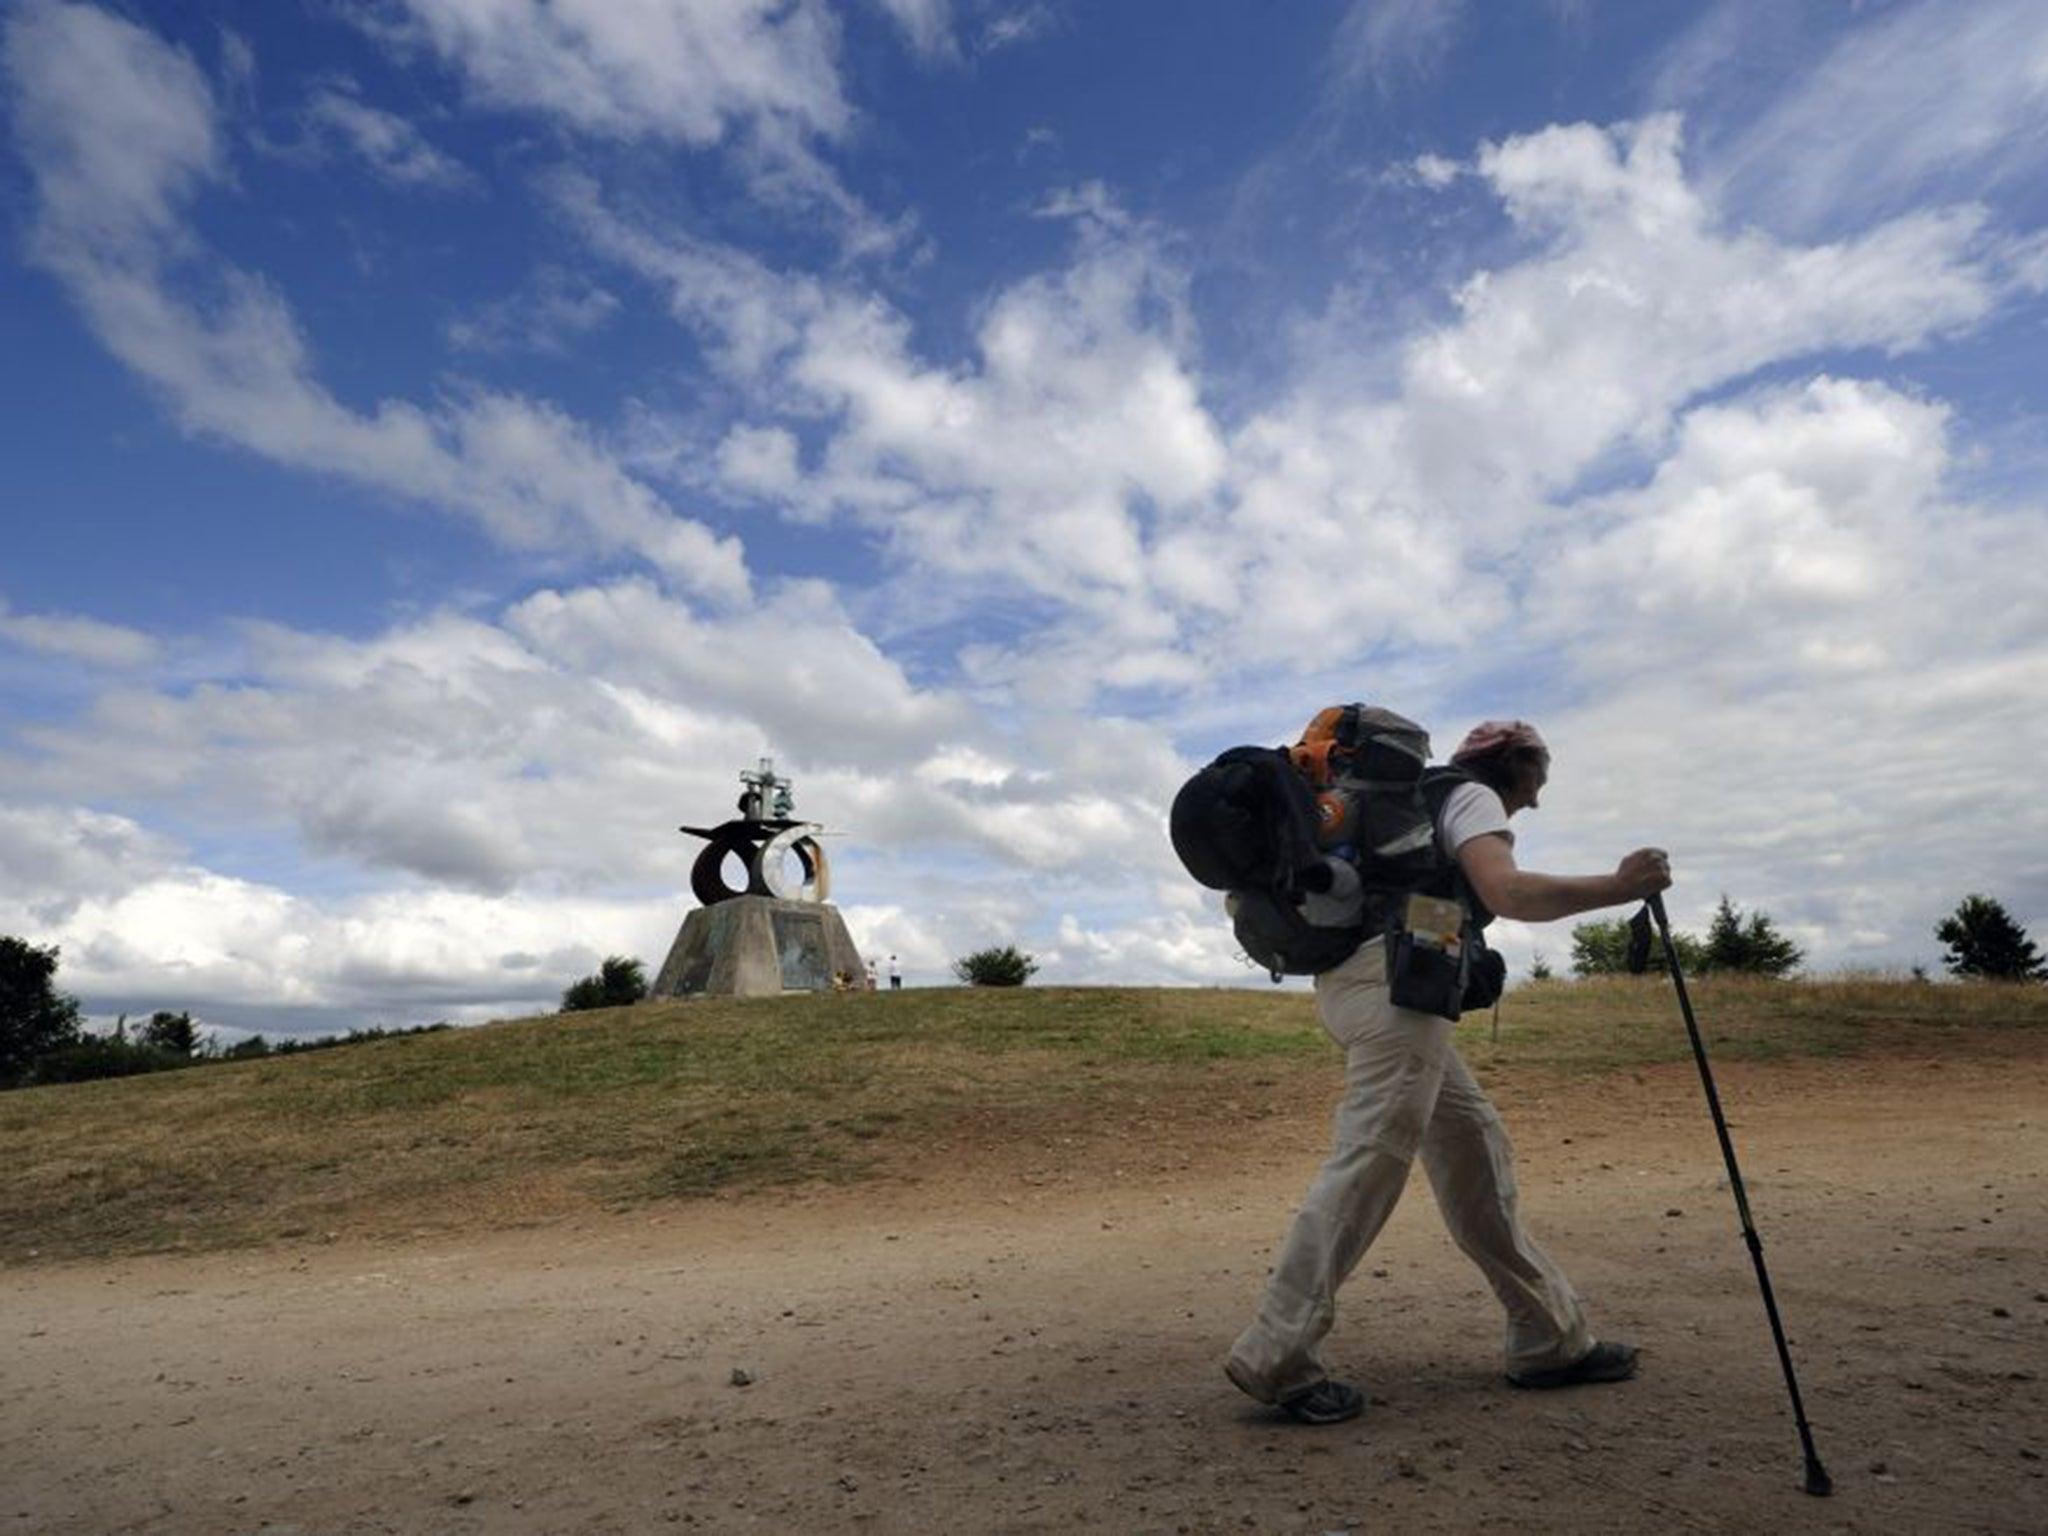 Camino De Santiago Pilgrims Can Take A Month Walking 455